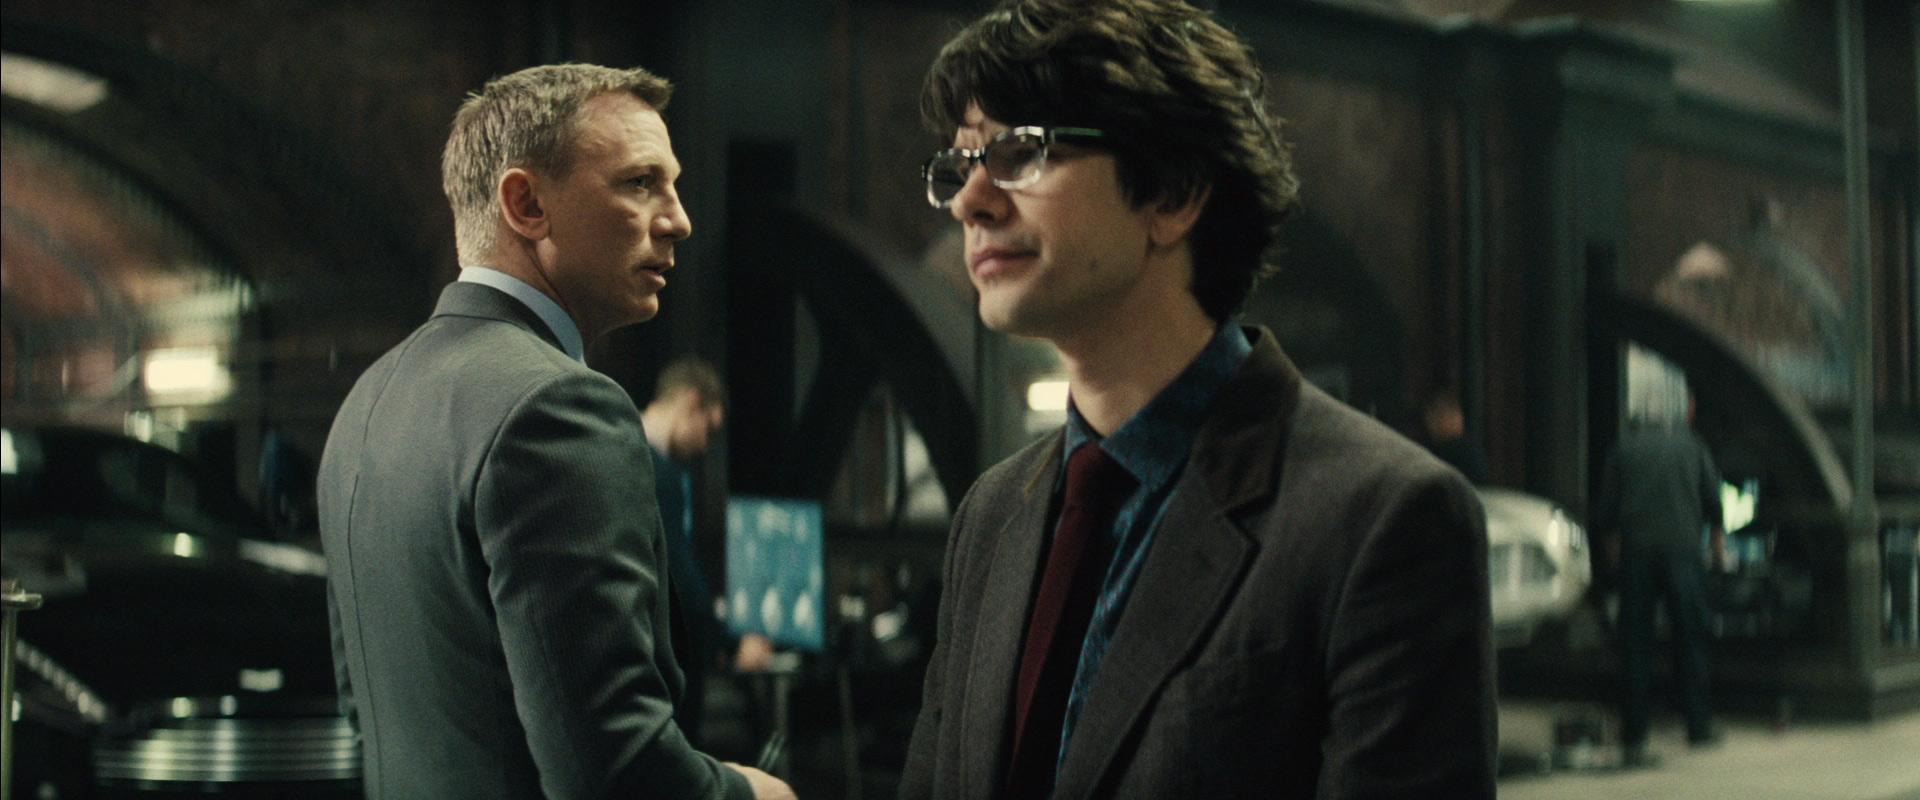 Daniel Craig and Ben Whishaw in Spectre (2015)